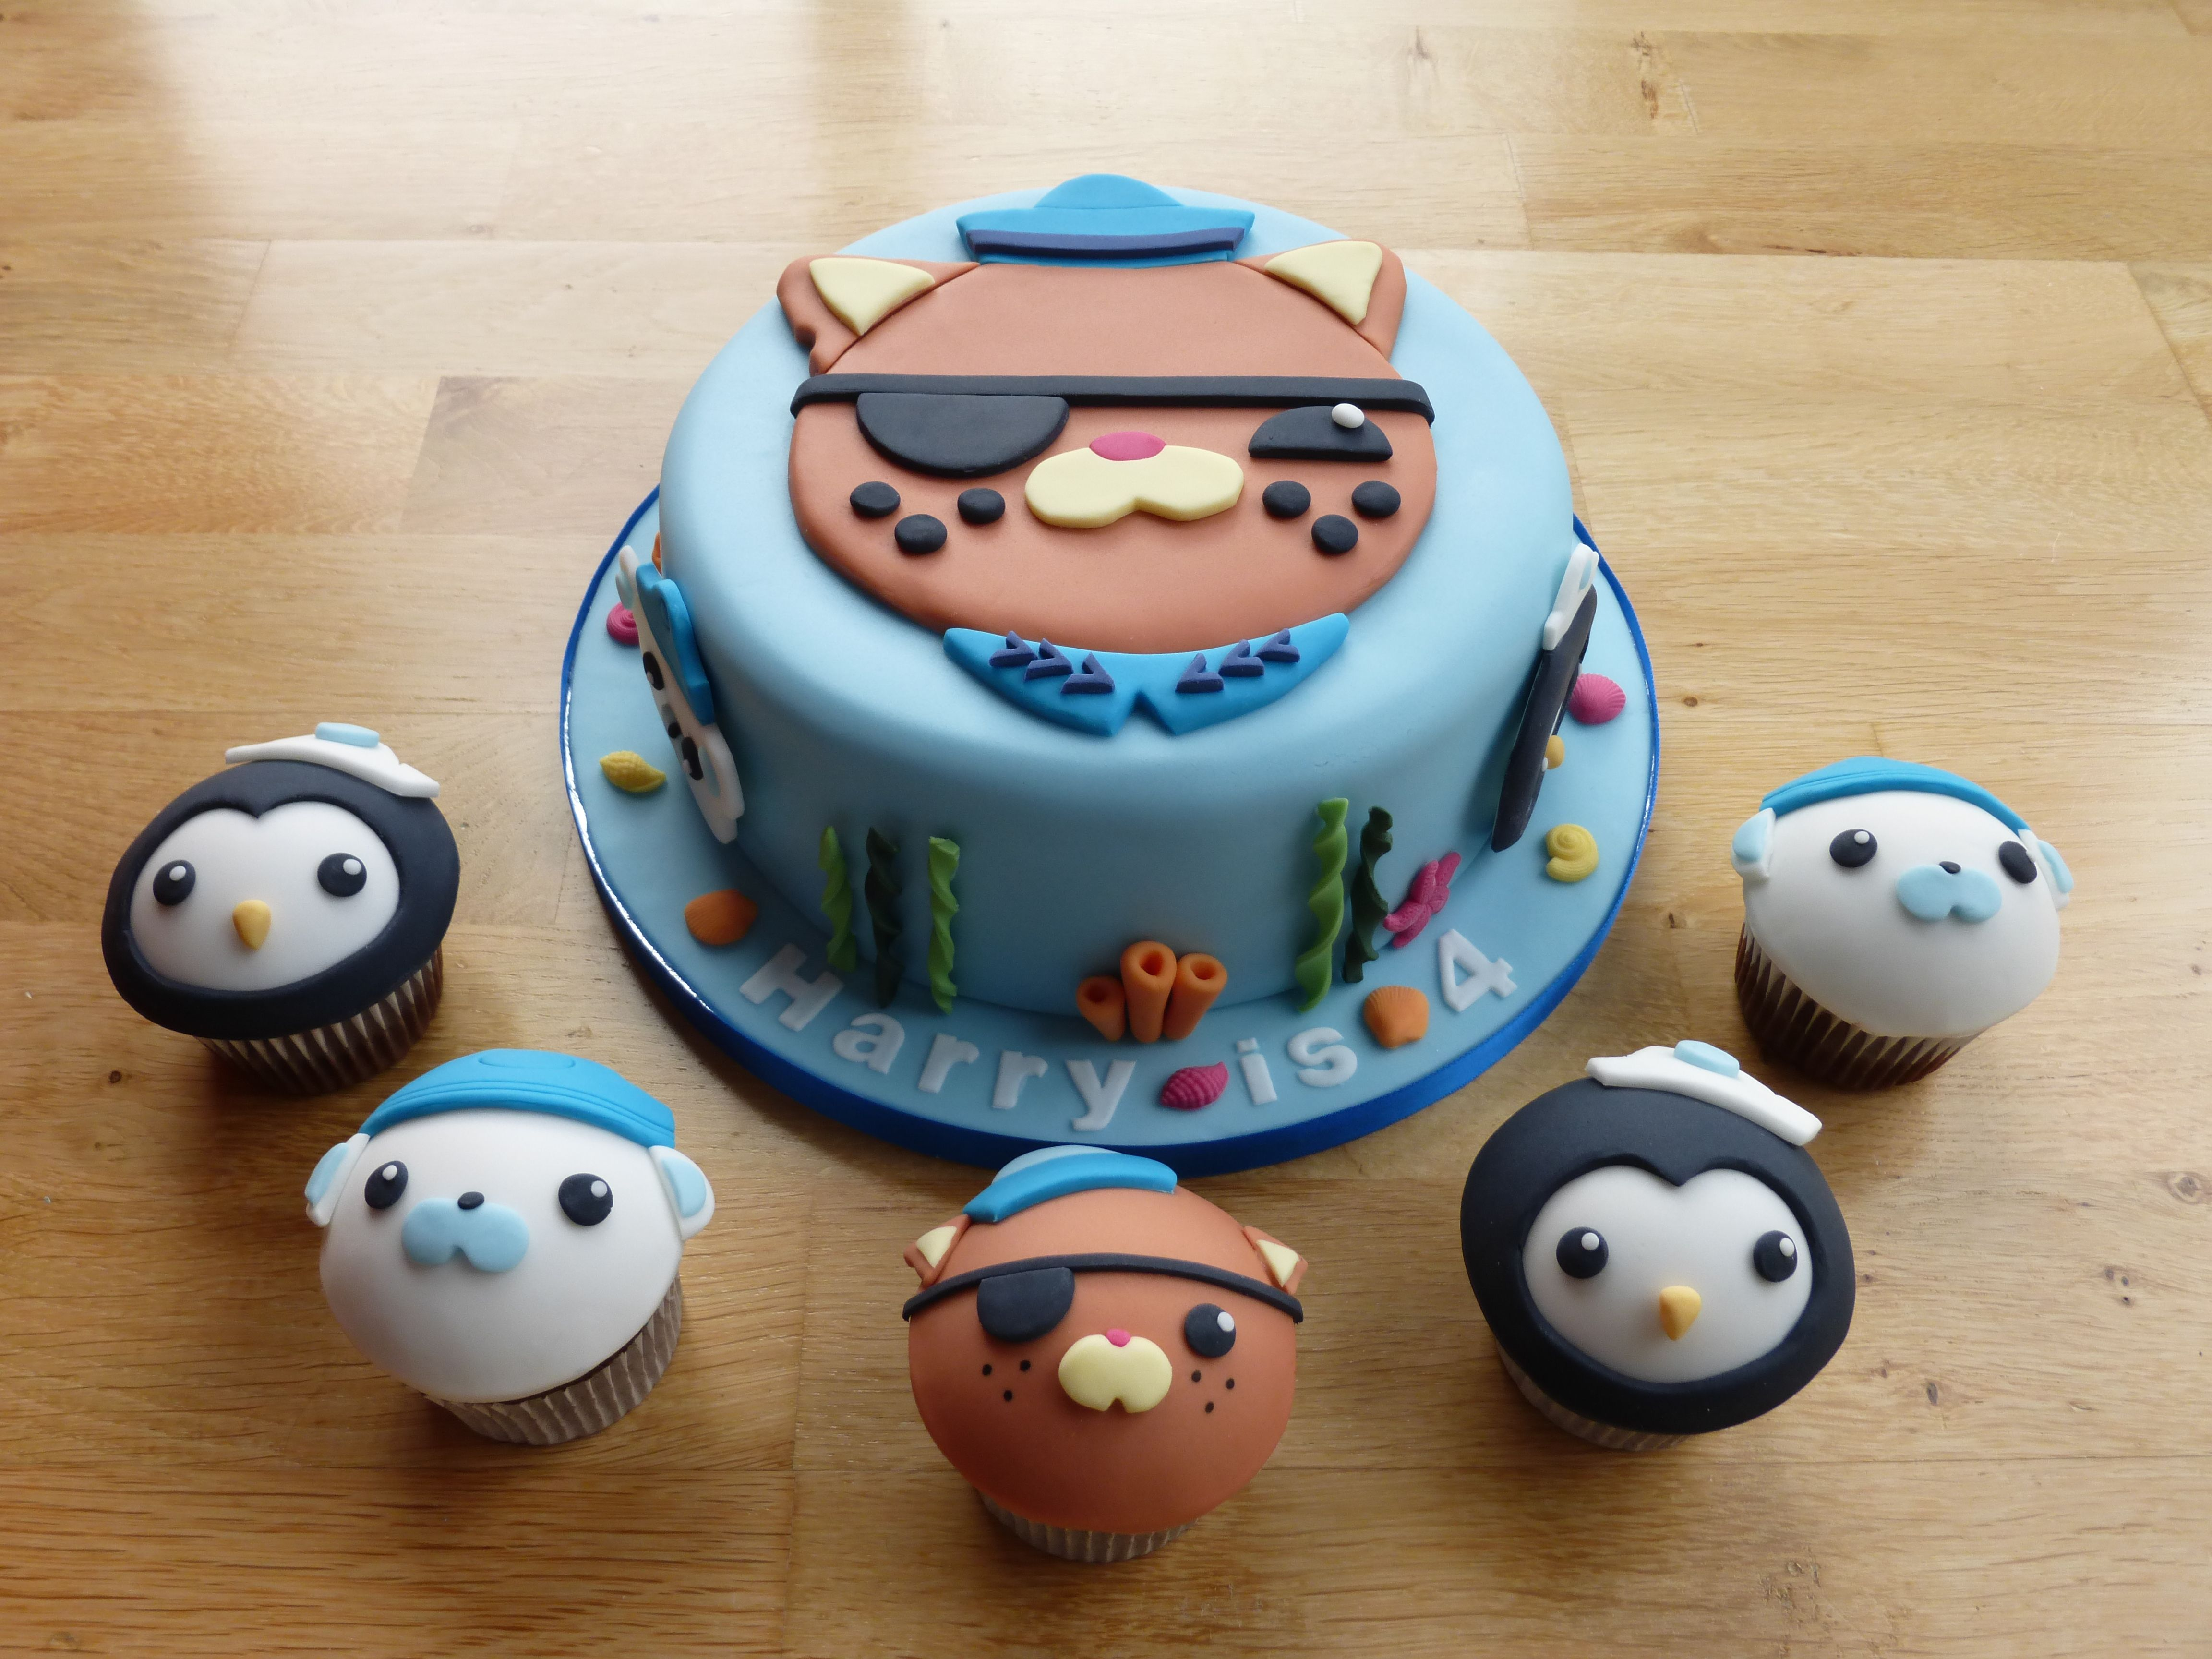 Kwazii Octonauts birthday cake and cupcakes Octonauts birtdhay